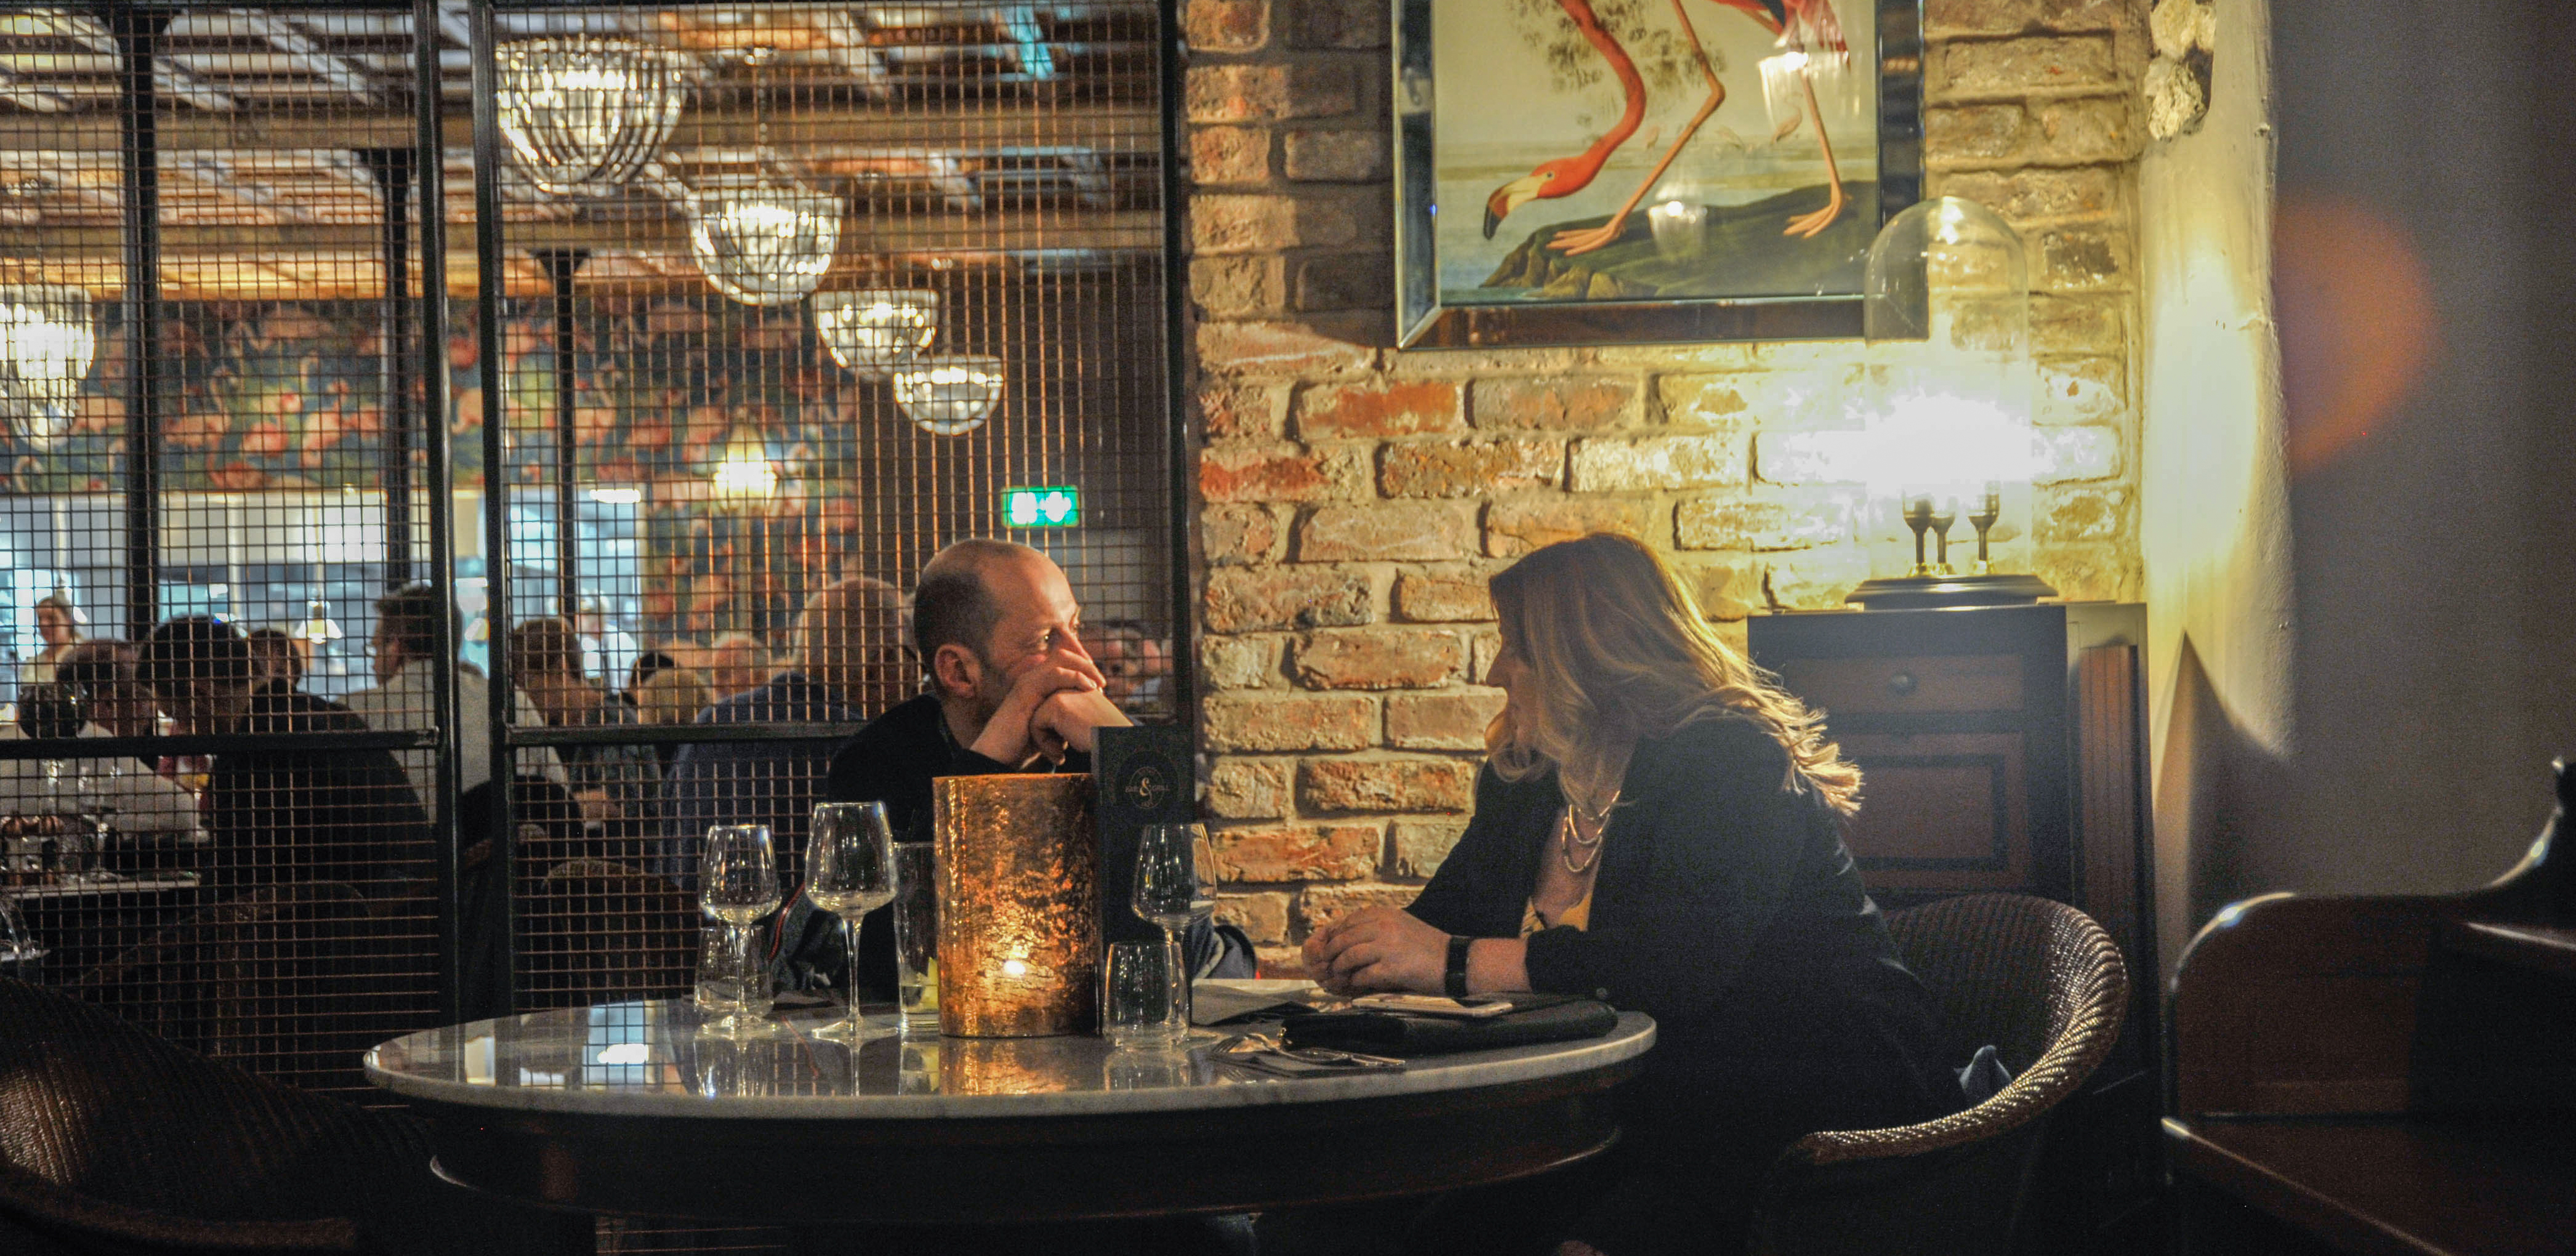 Bistro, Bar & Grill